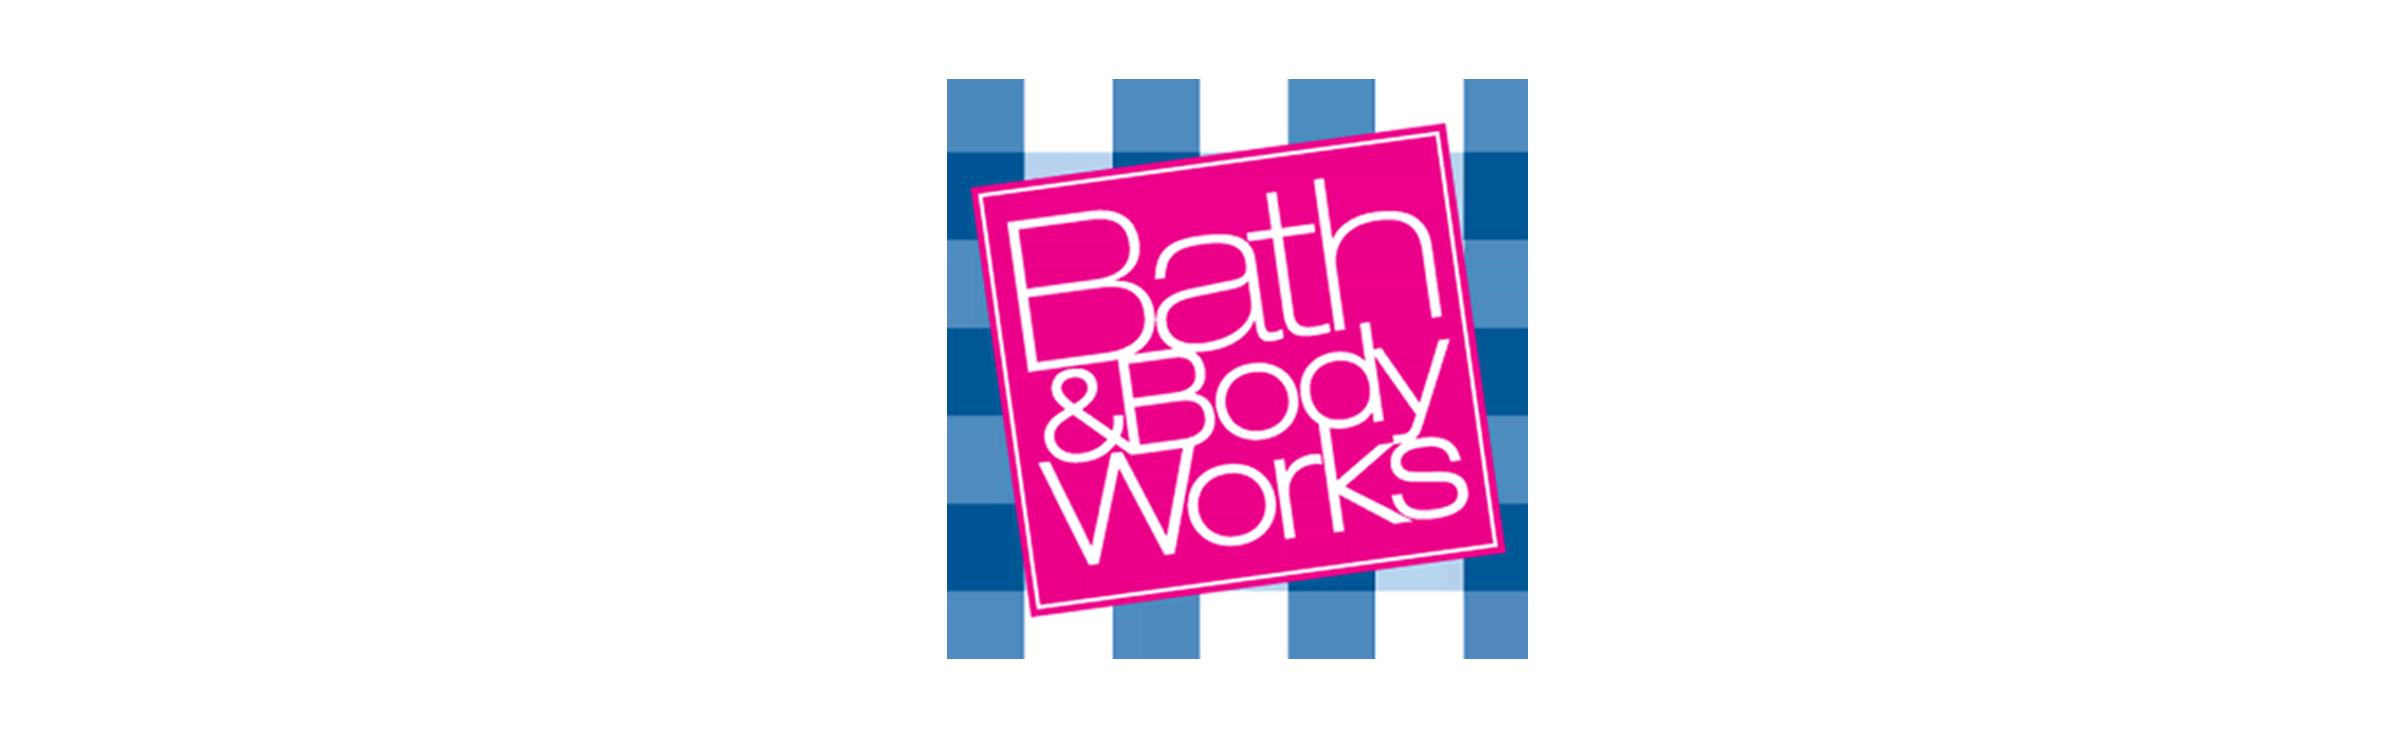 BathBodyWorks.png